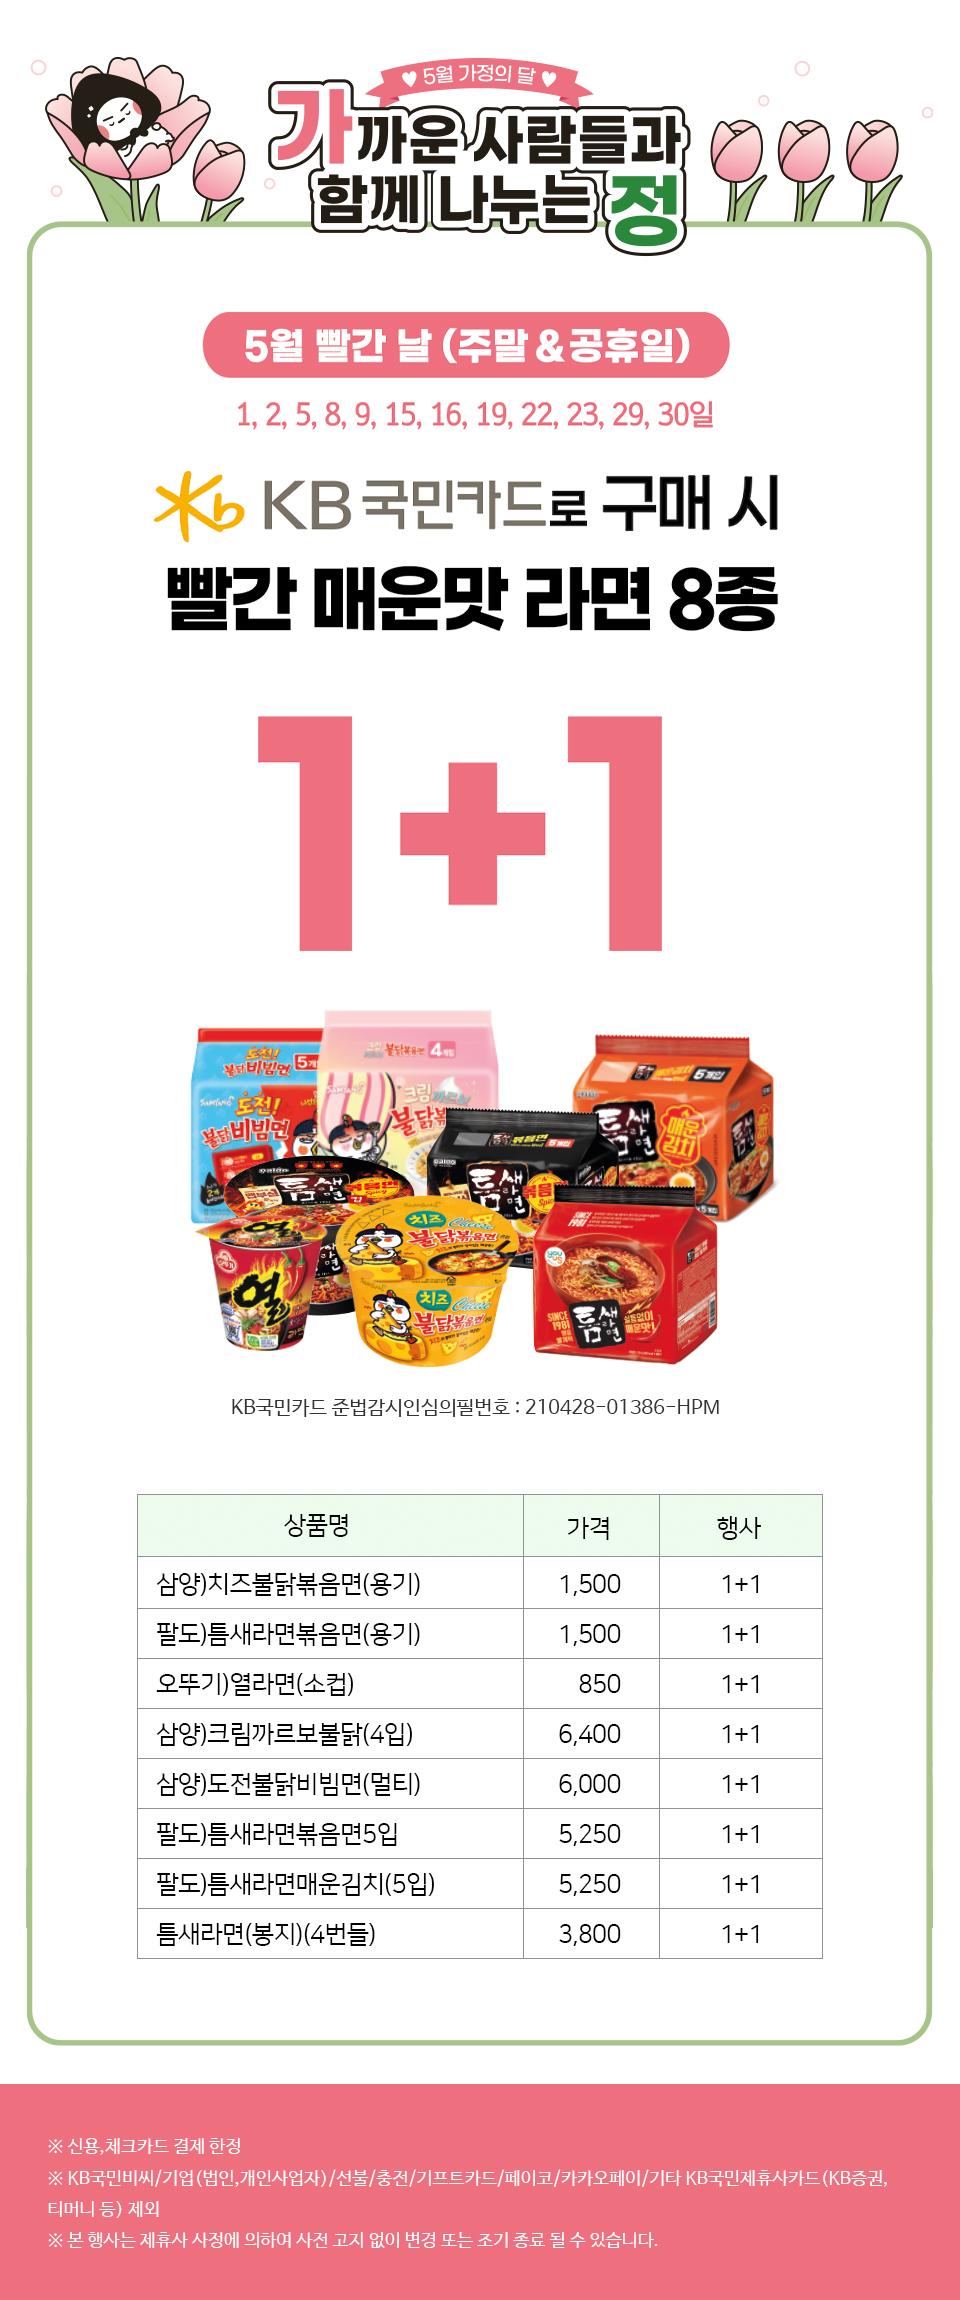 KB국민카드로 구매 시 빨간 매운맛 라면 8종 1+1